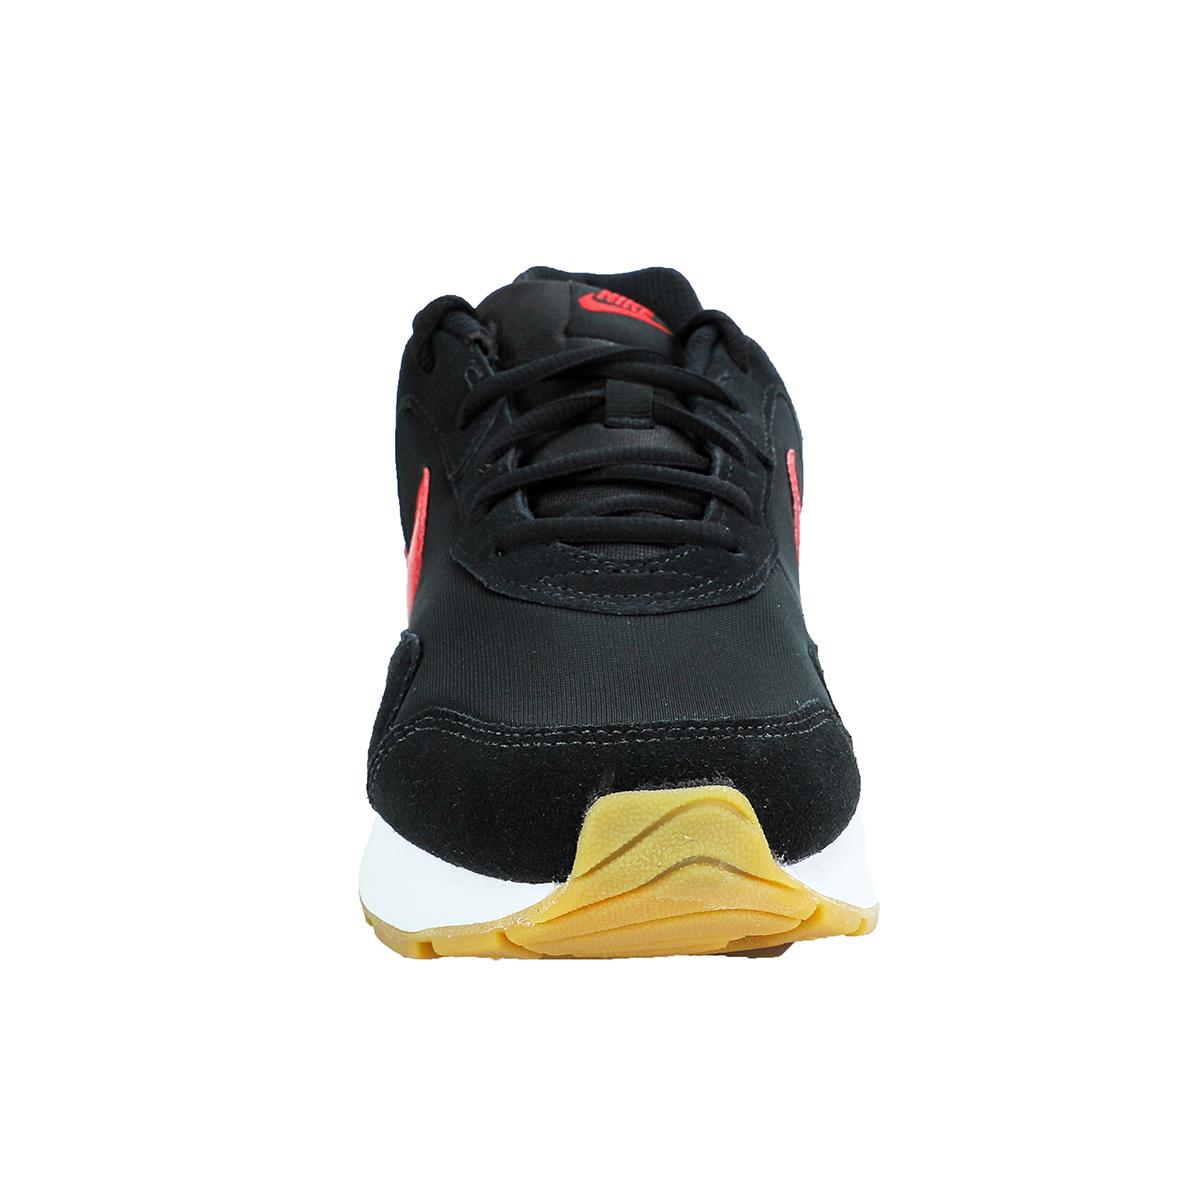 Nike-Men-039-s-Delfine-Running-Shoes thumbnail 7